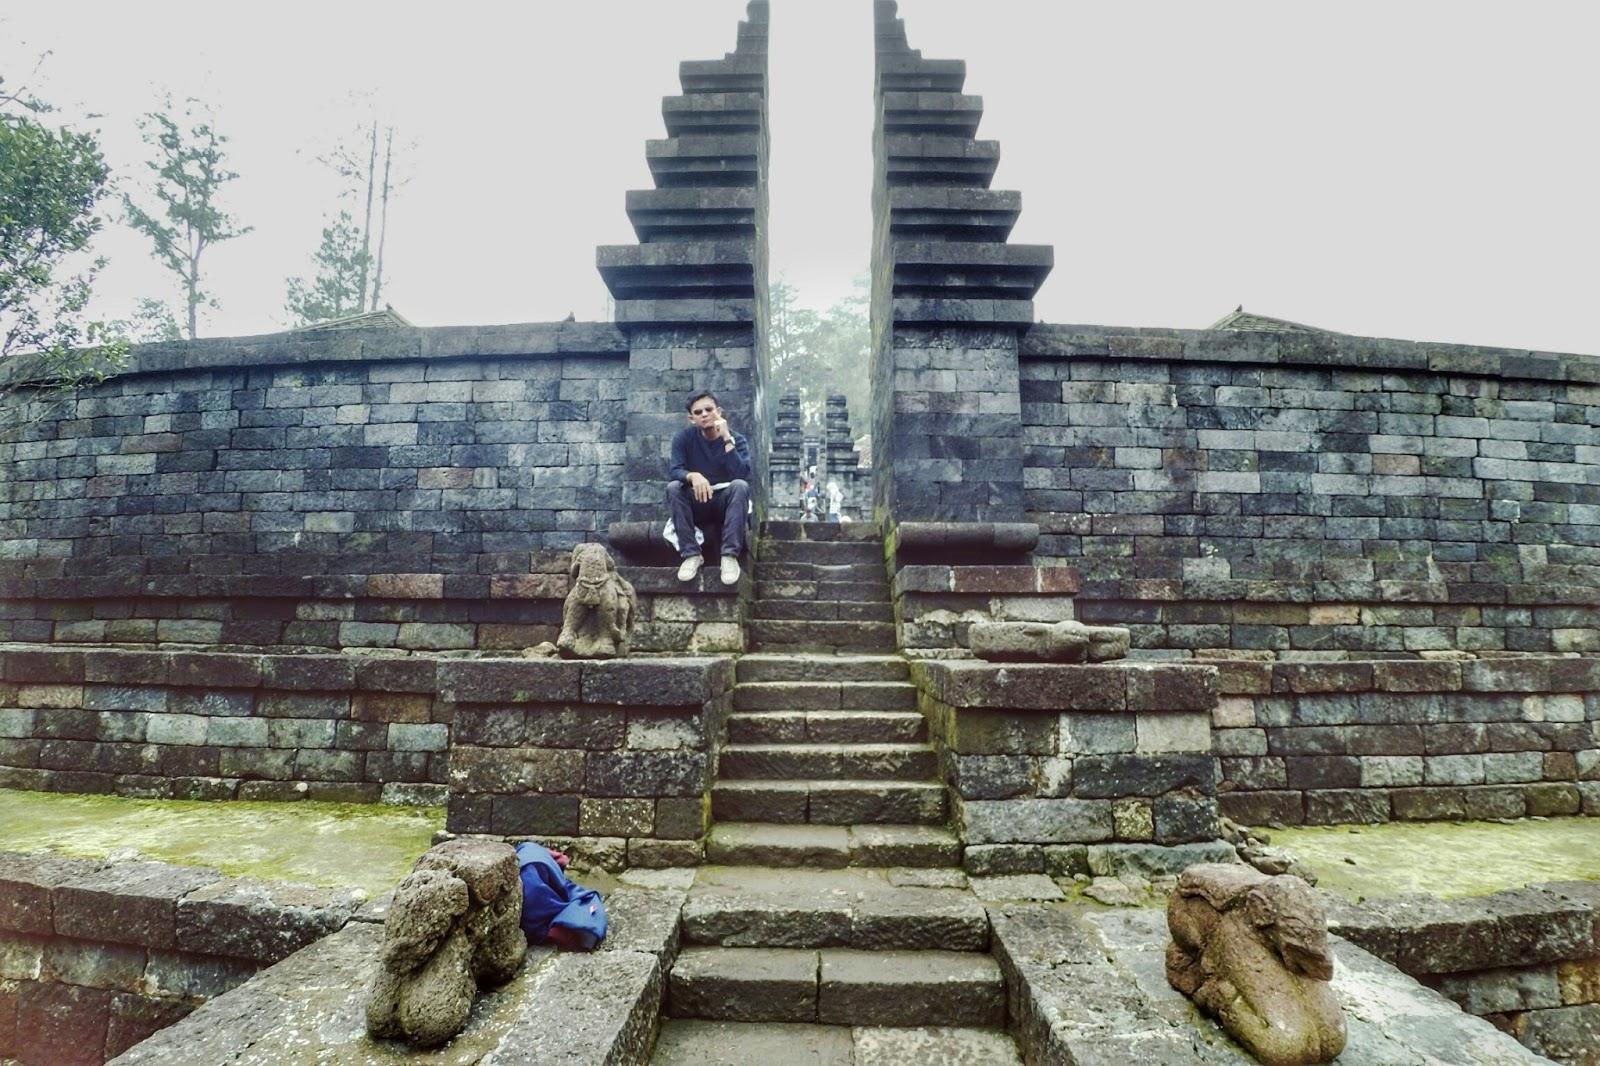 Candi Cetho Lereng Gunung Lawu Perpaduan Apik Wisata Alam